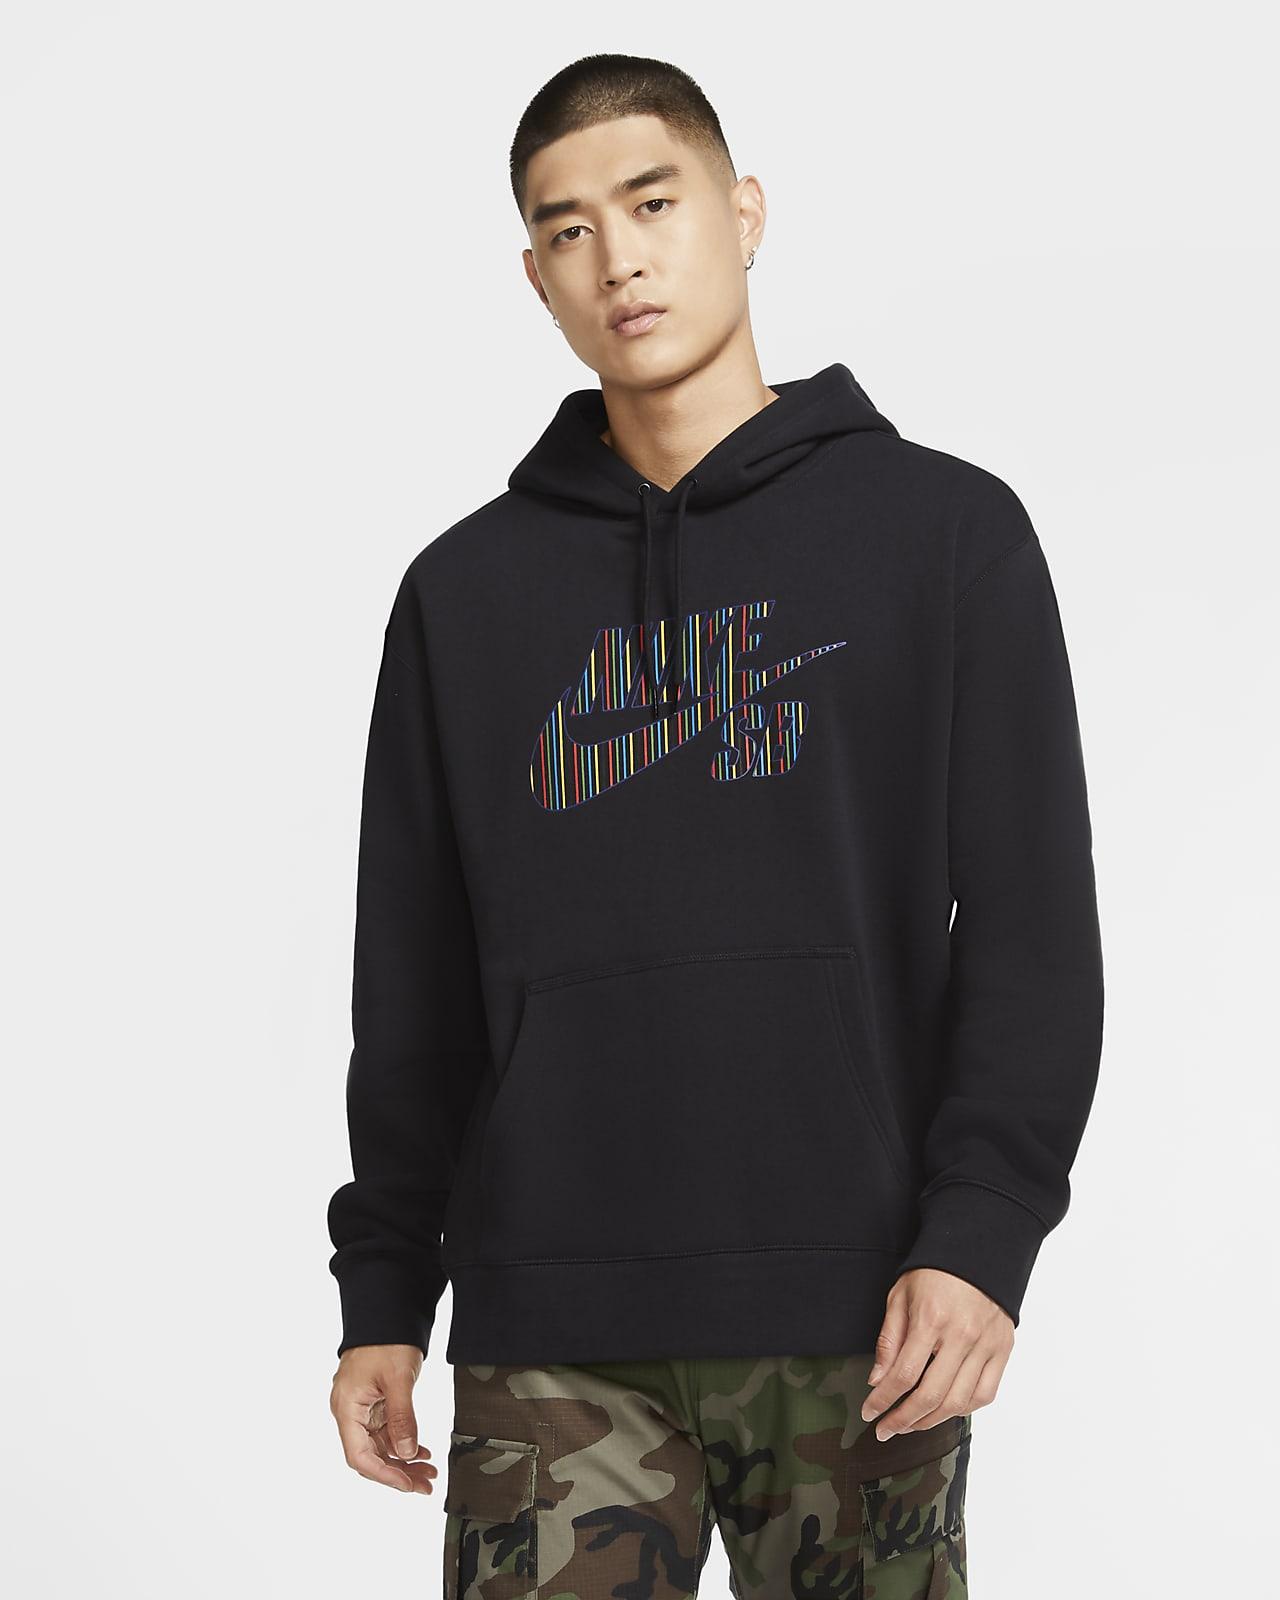 Nike SB Çizgili Erkek Kapüşonlu Kaykay Üstü